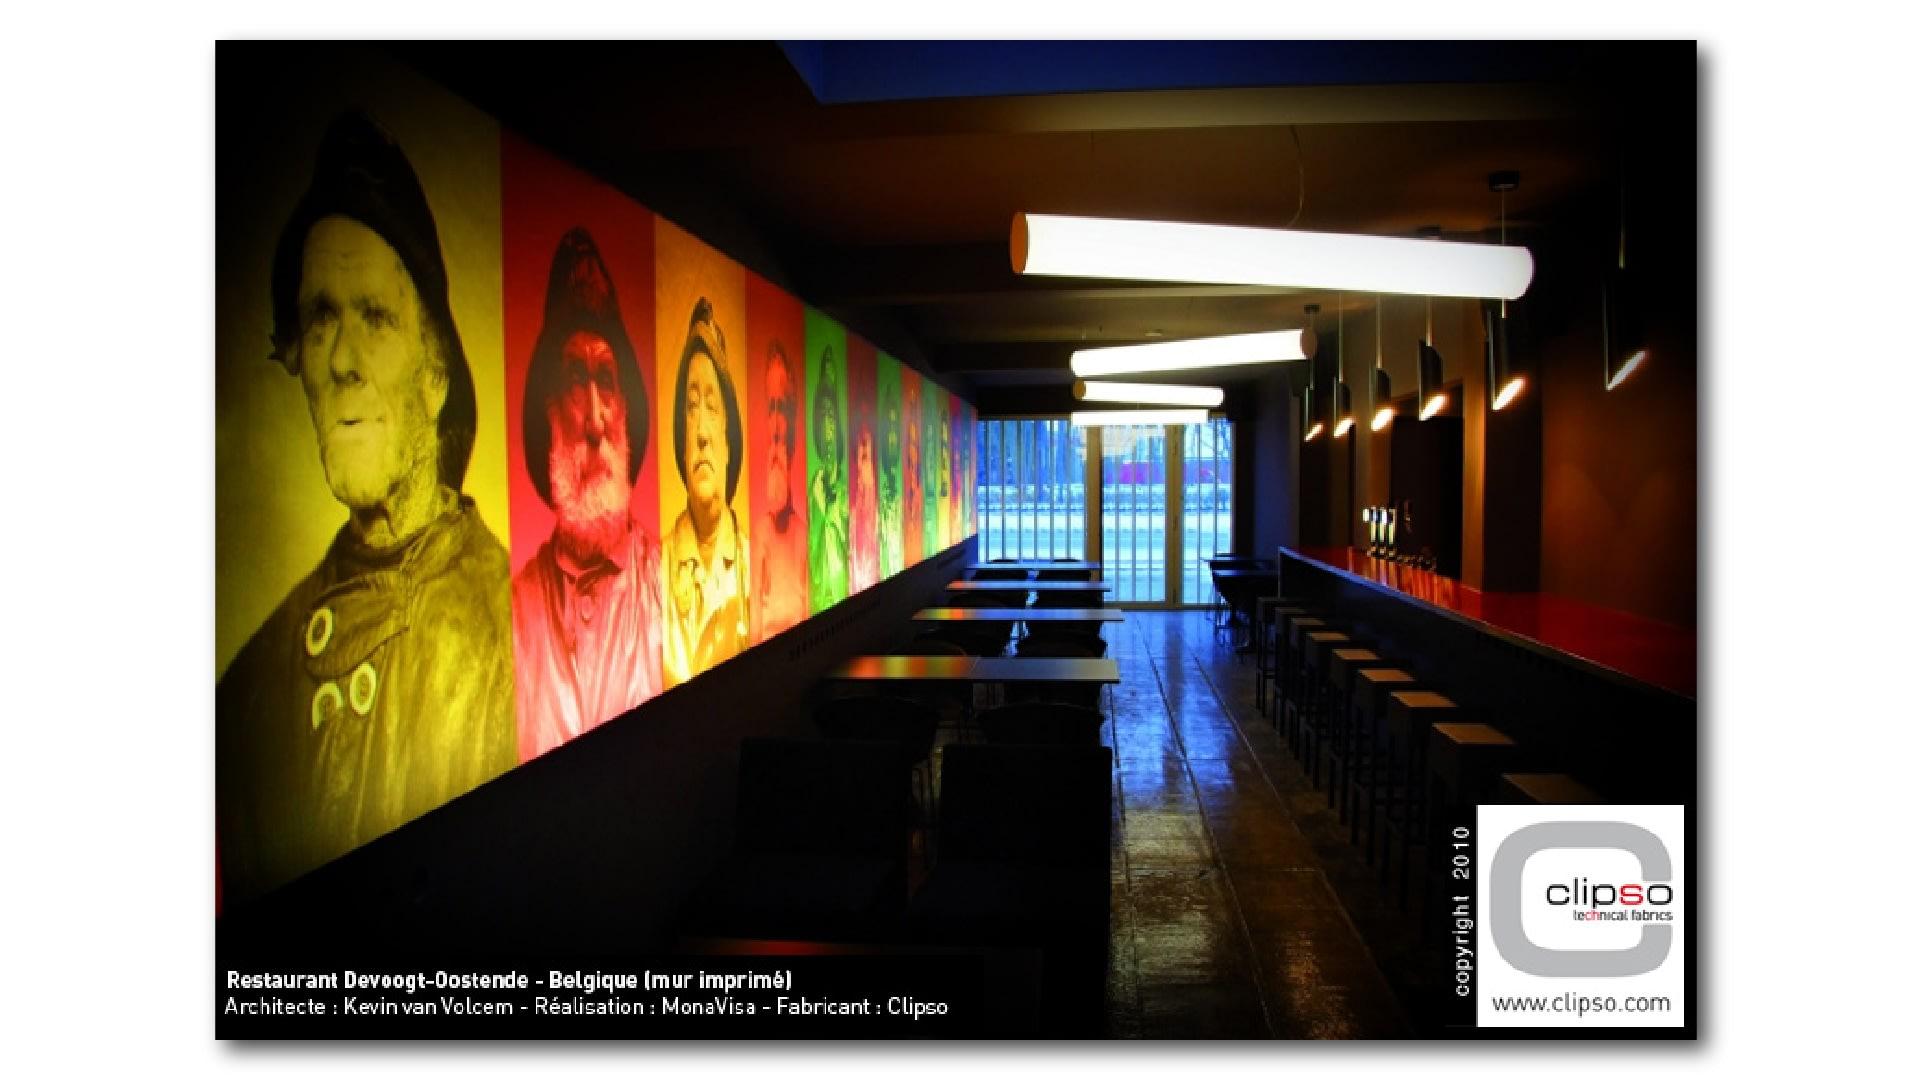 digitaldruck-wand-restaurant-devoogt-oostende-clipso-print-01_a9tufk